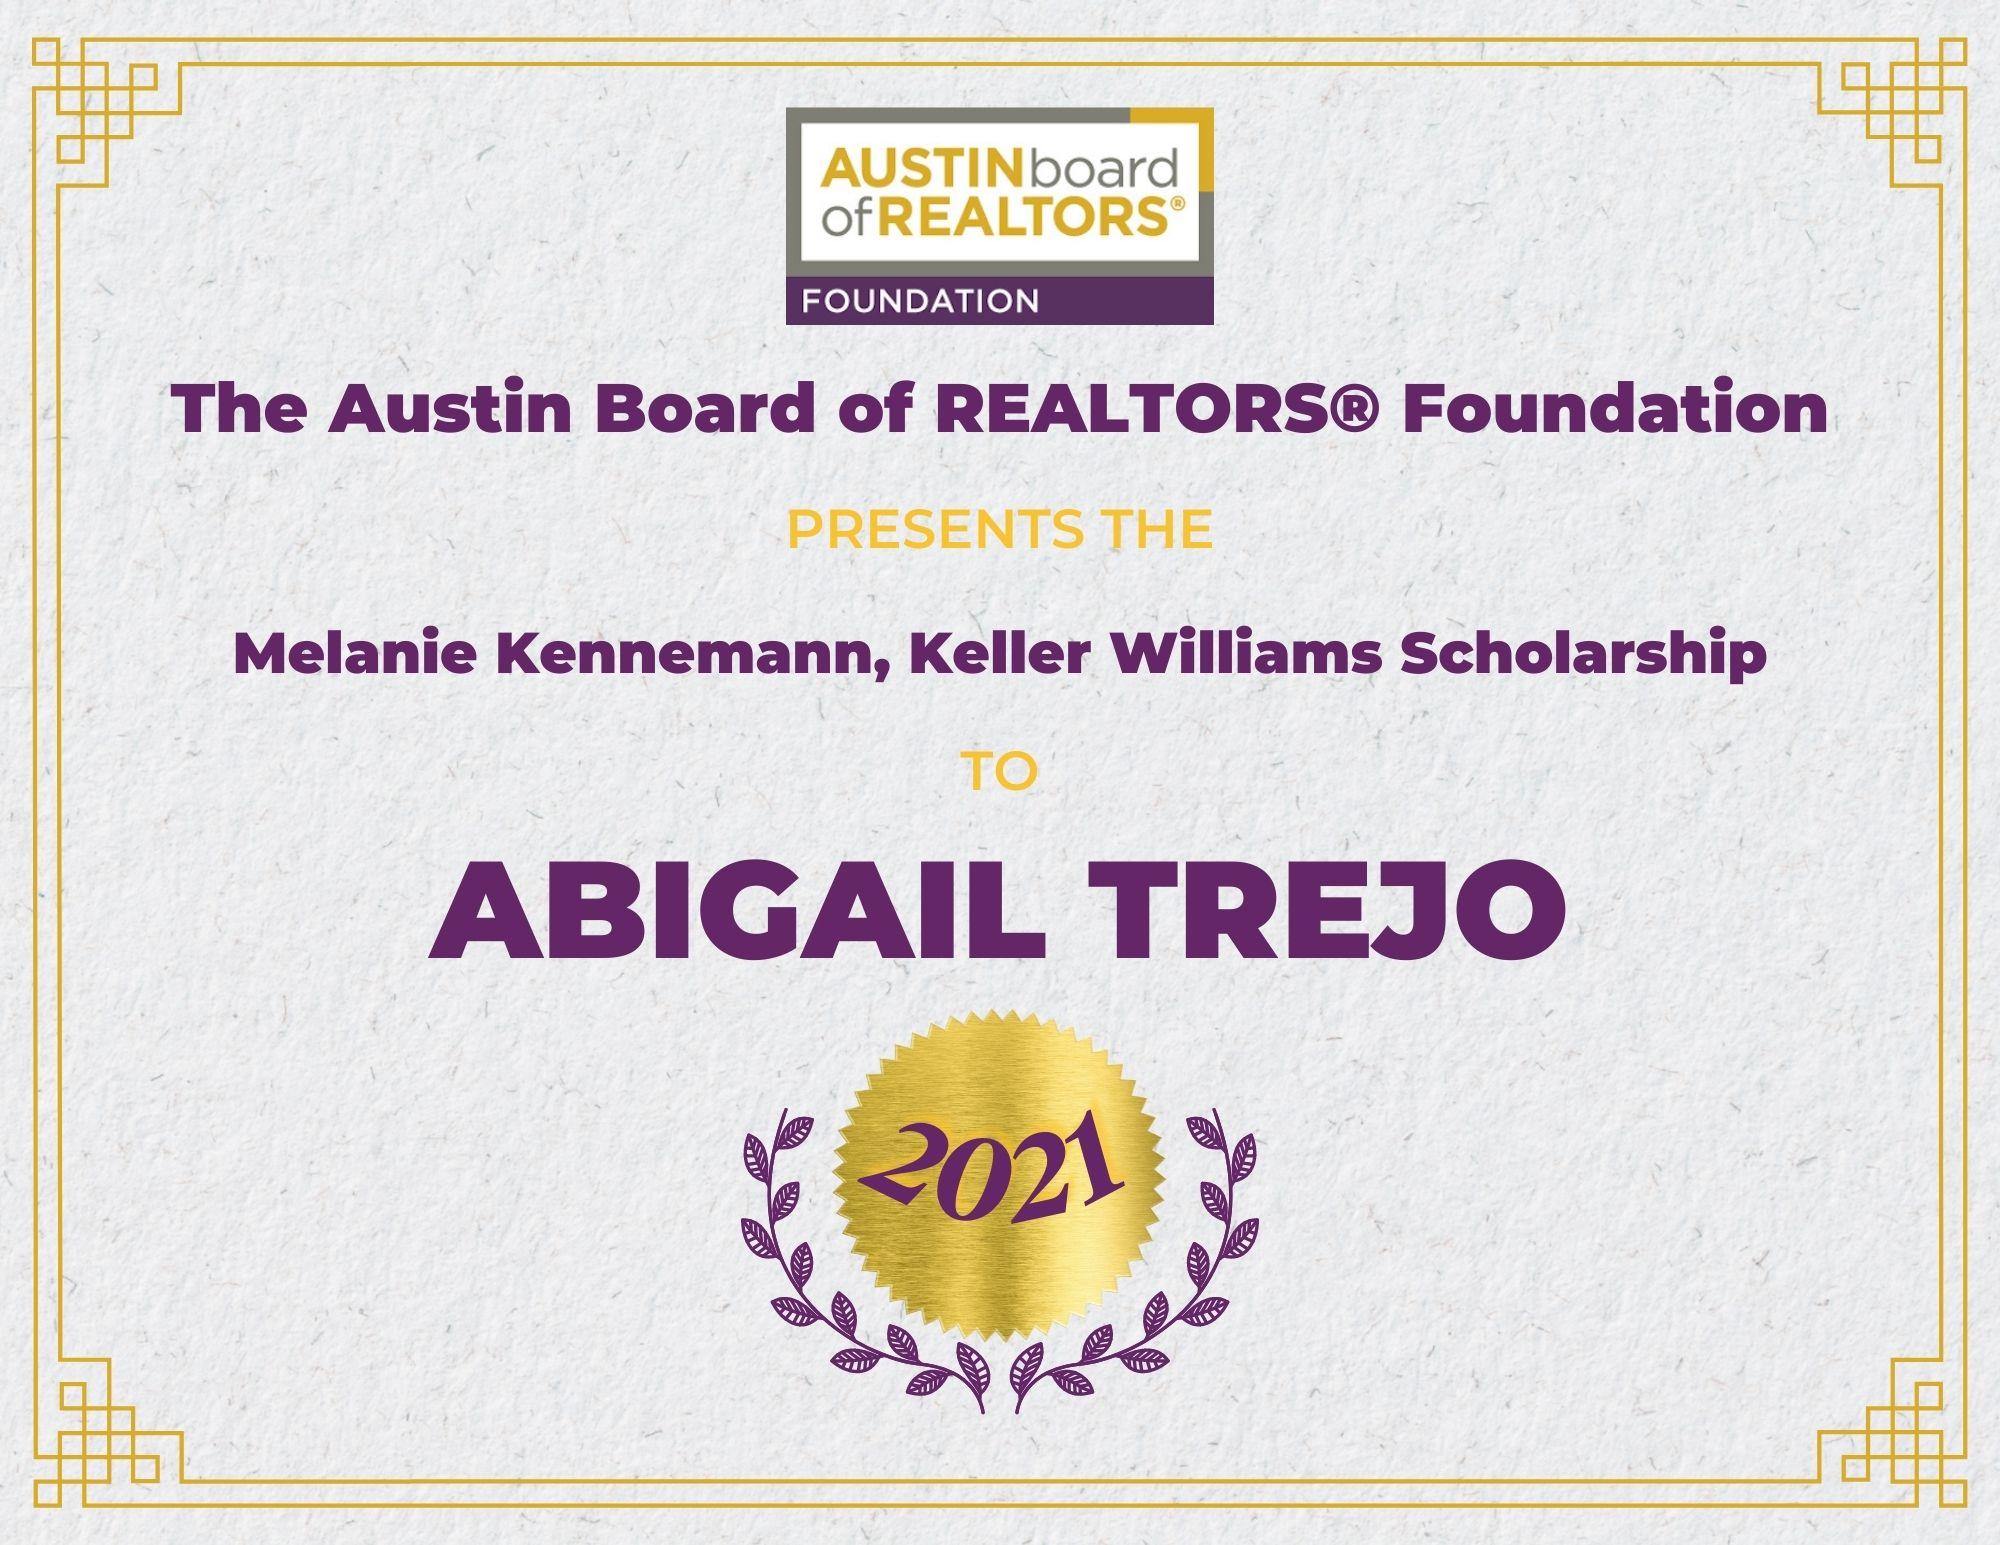 2021 Fou Scholarship Certificate Abigailtrejo